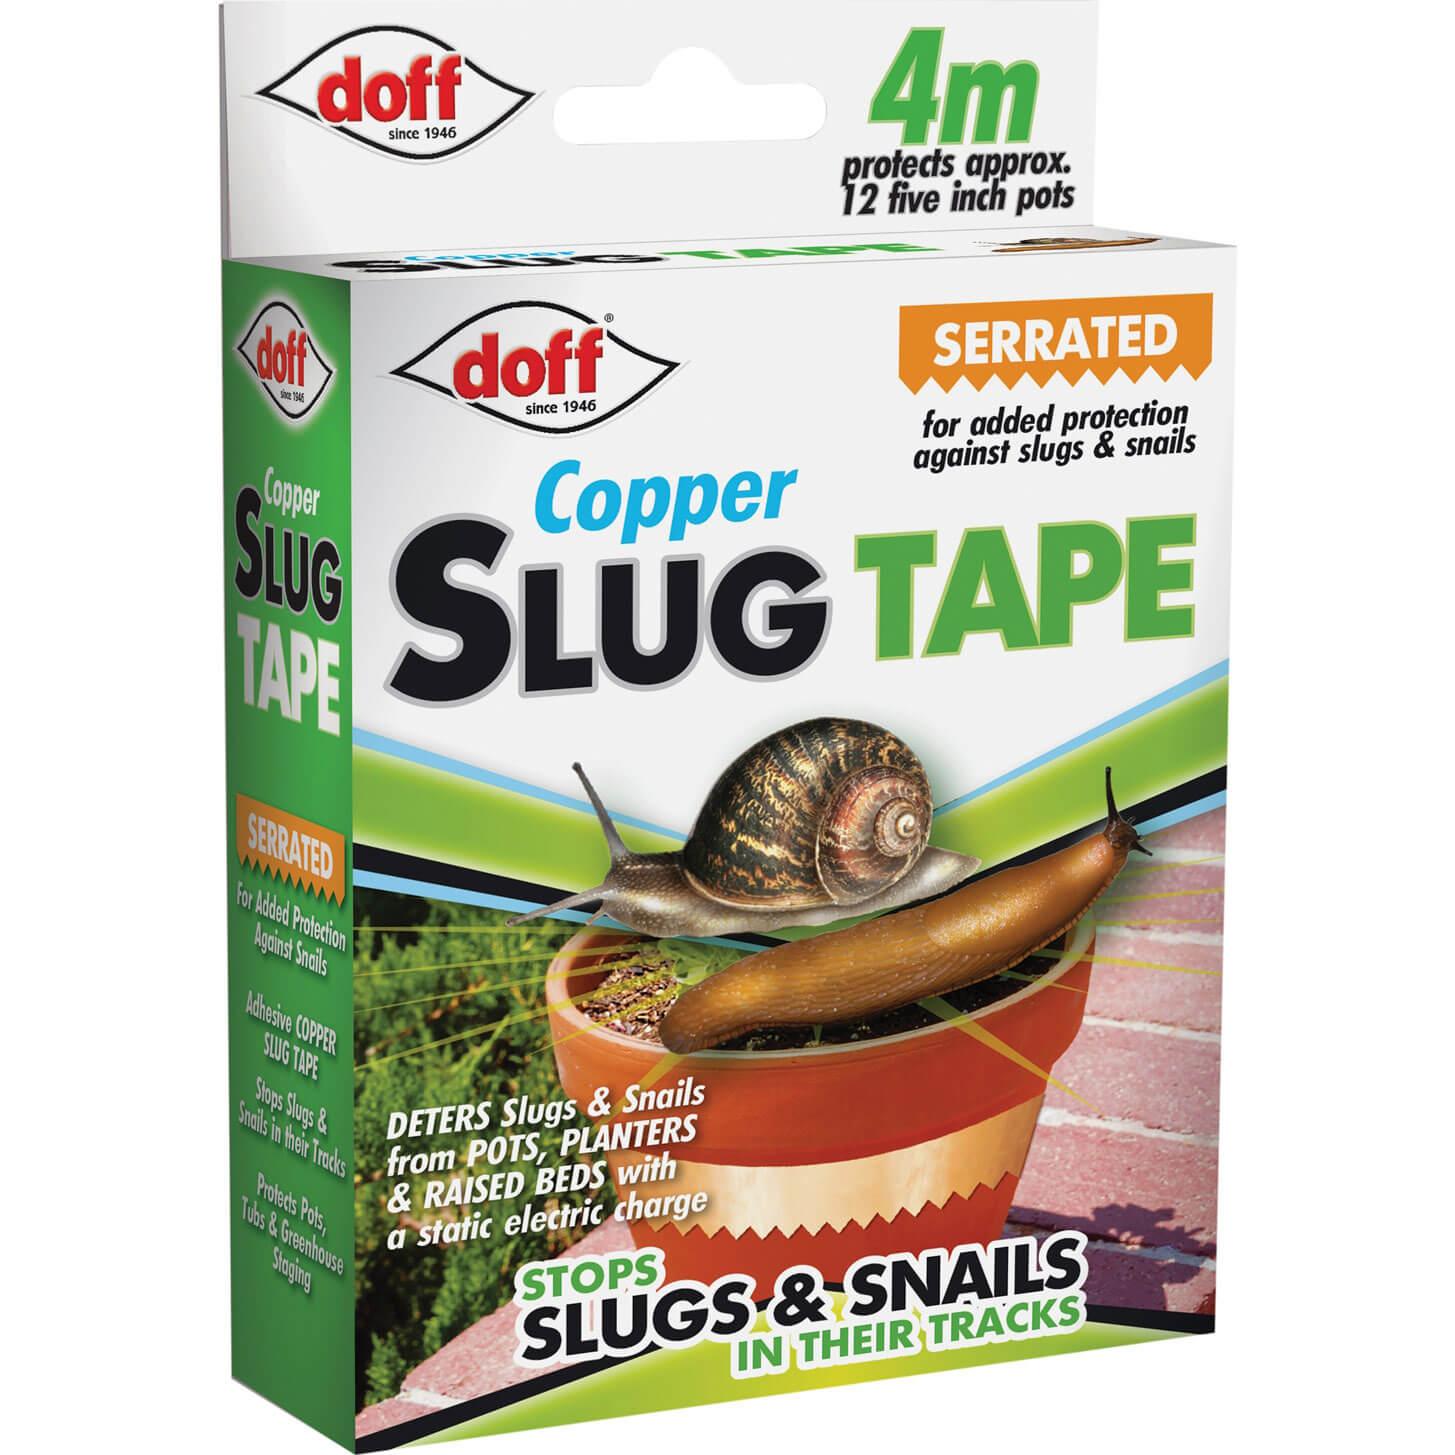 Image of Doff Adhesive Copper Slug & Snail Tape 4m